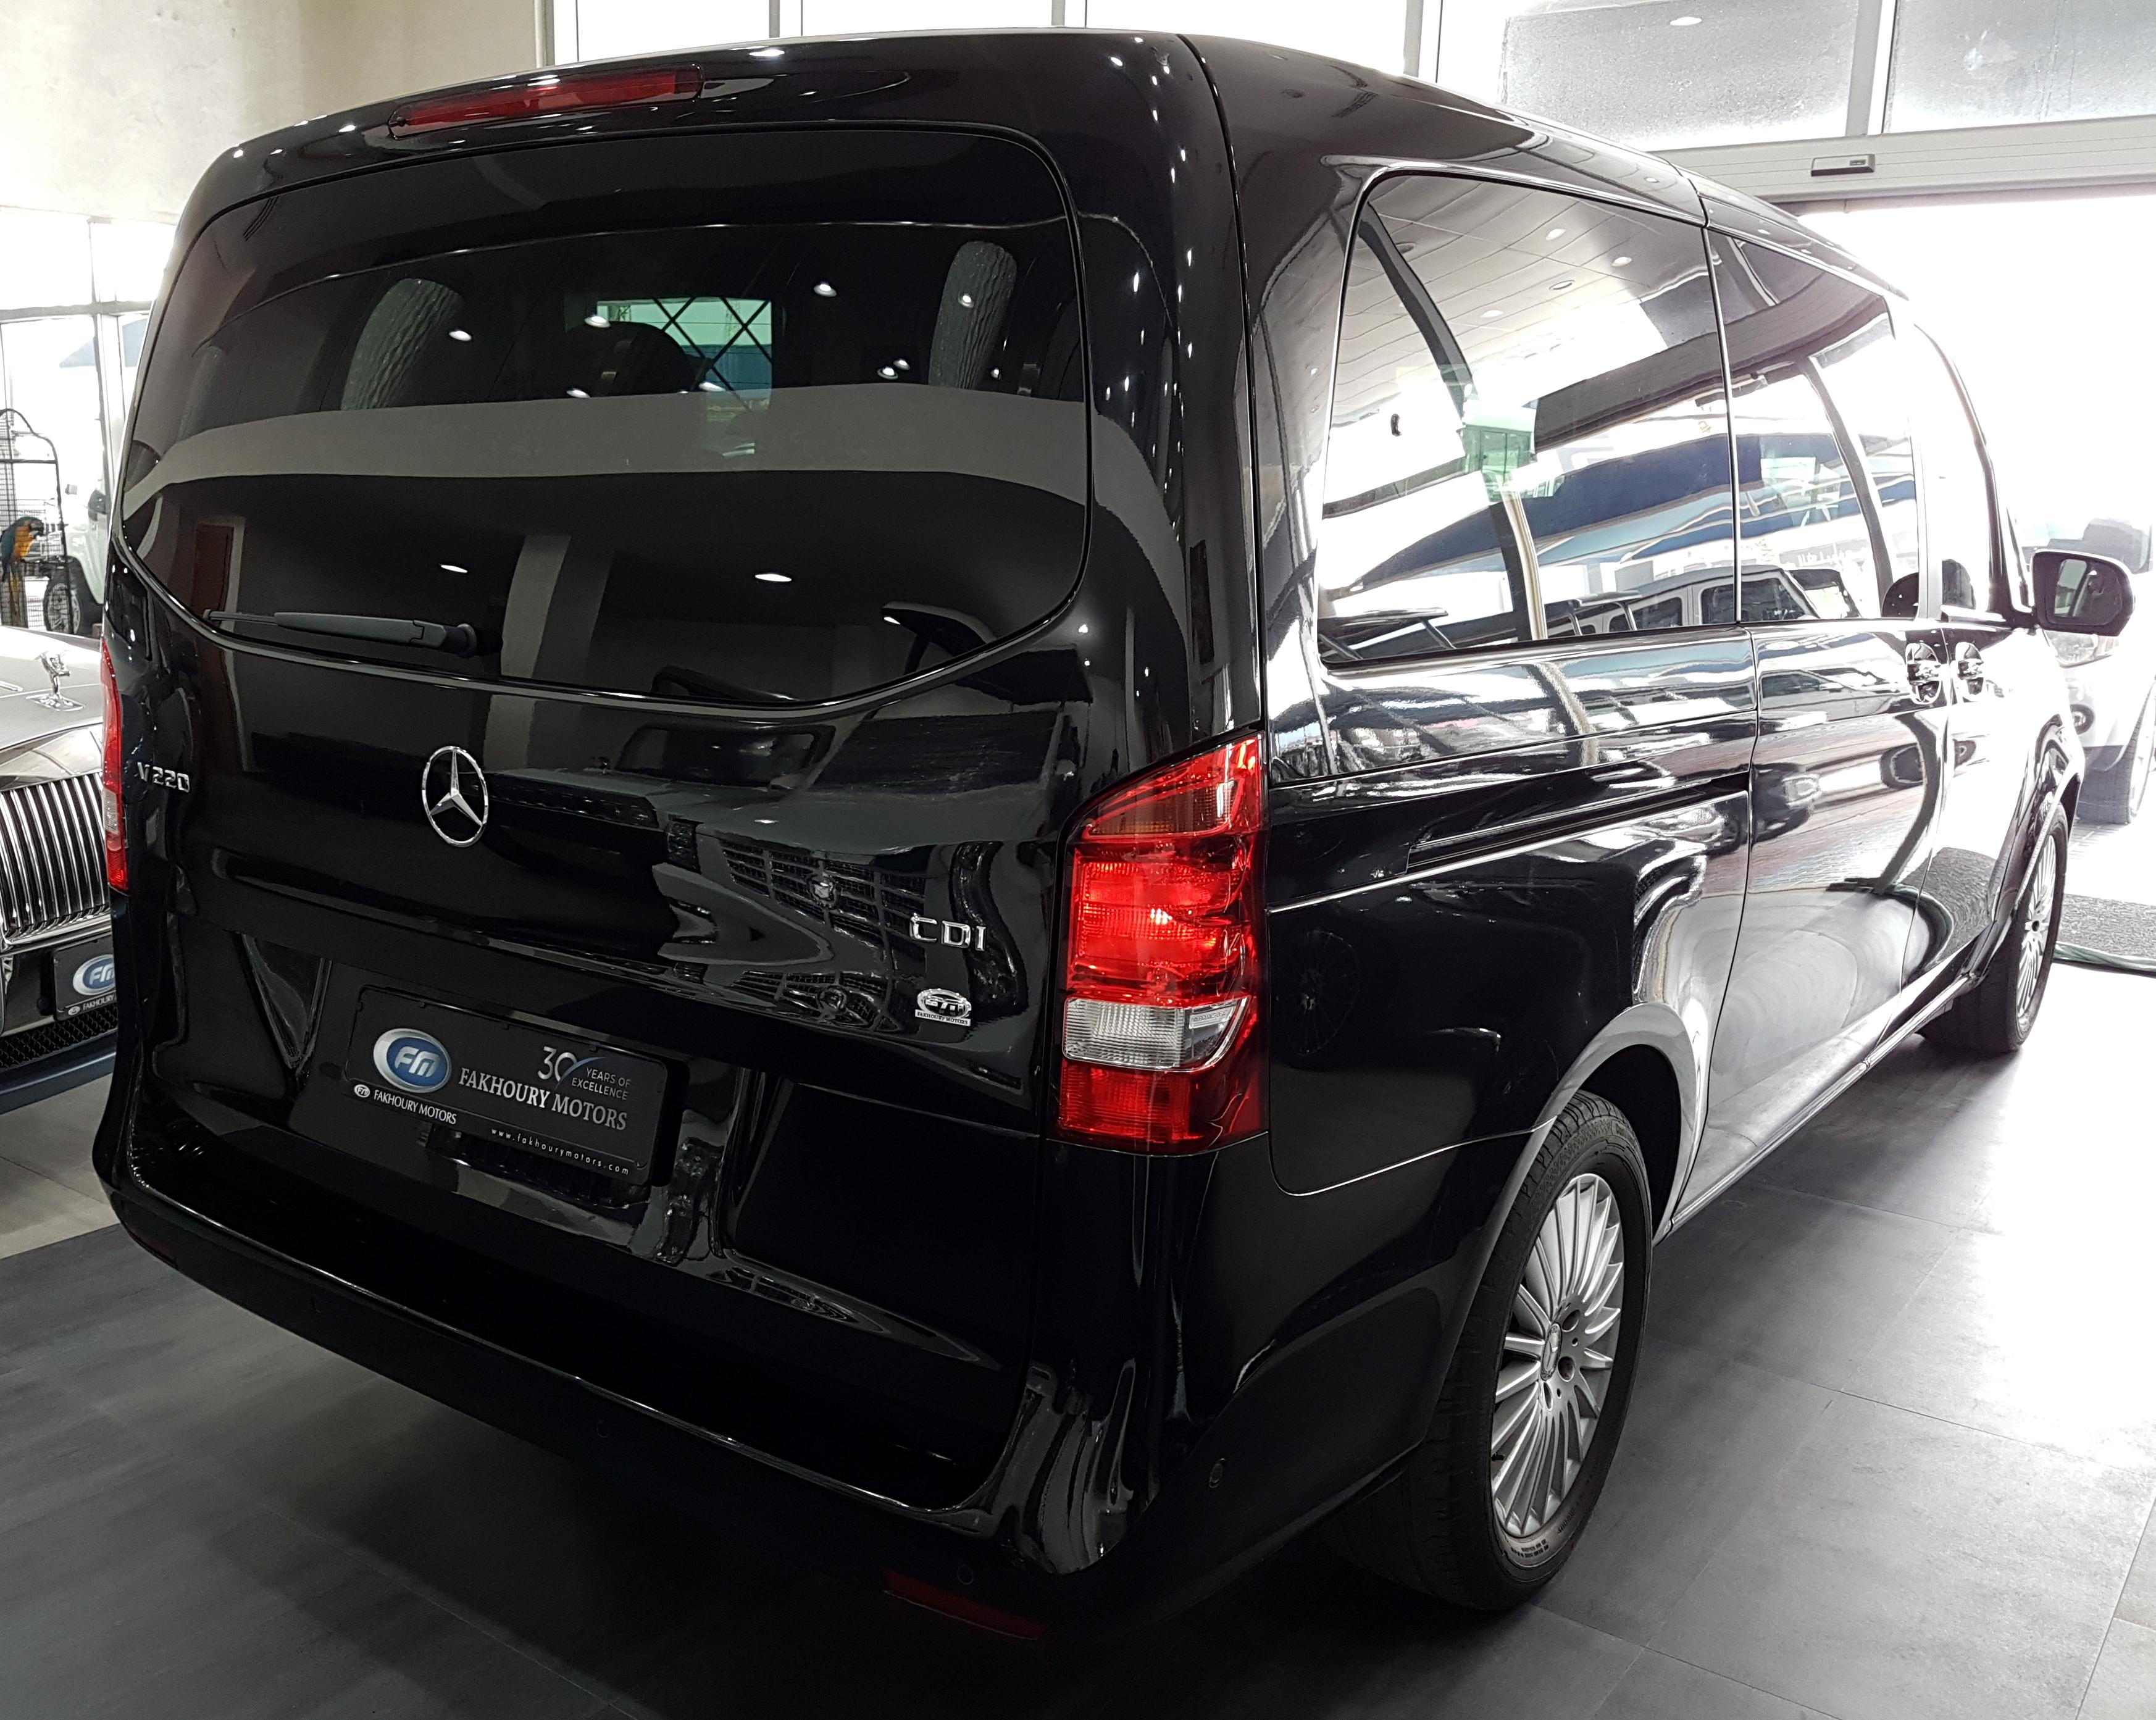 listings mercedes benz fakhoury motors minivan cdi